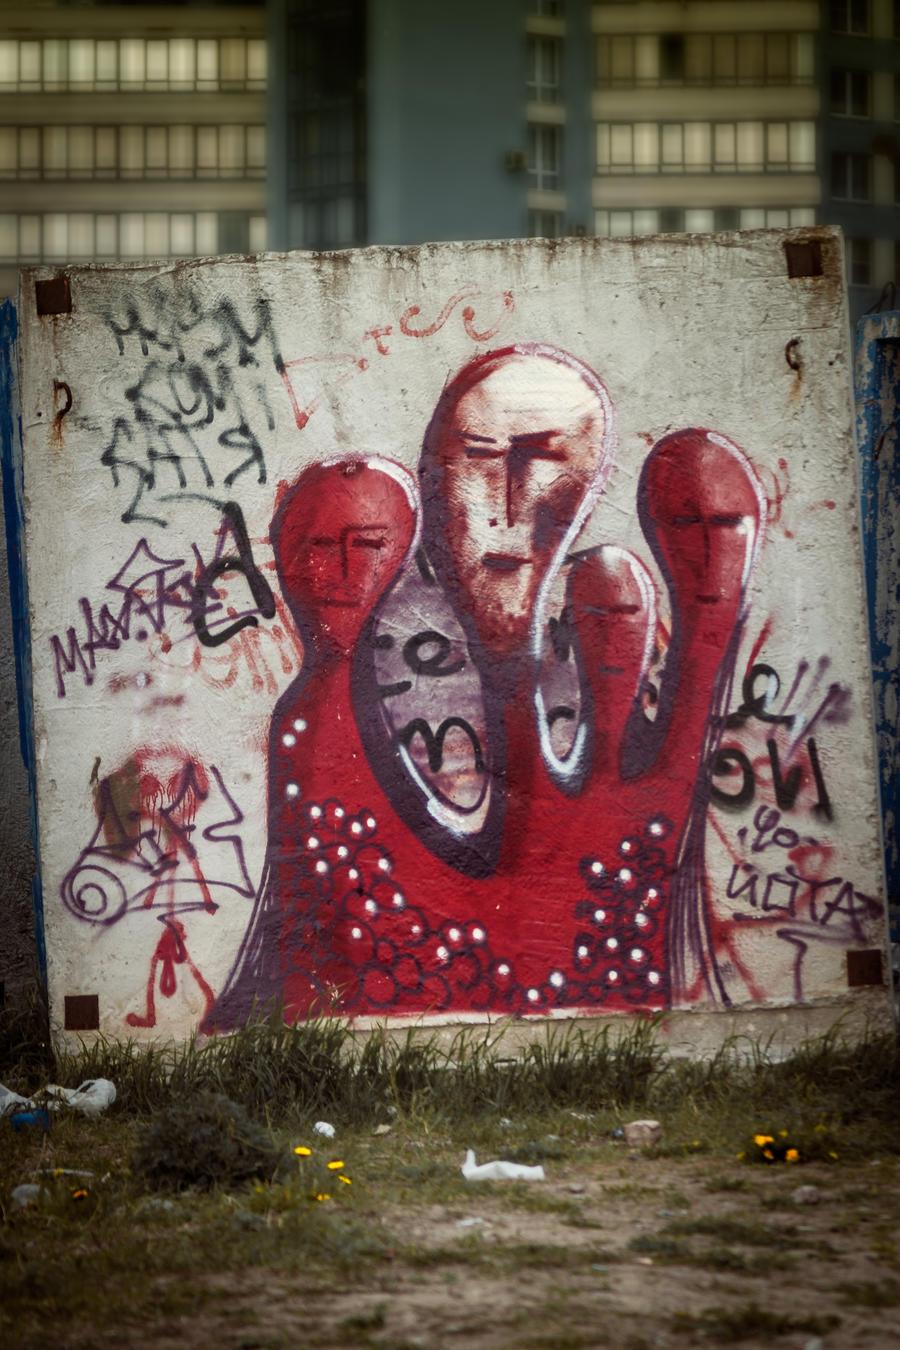 Street Art by xrust